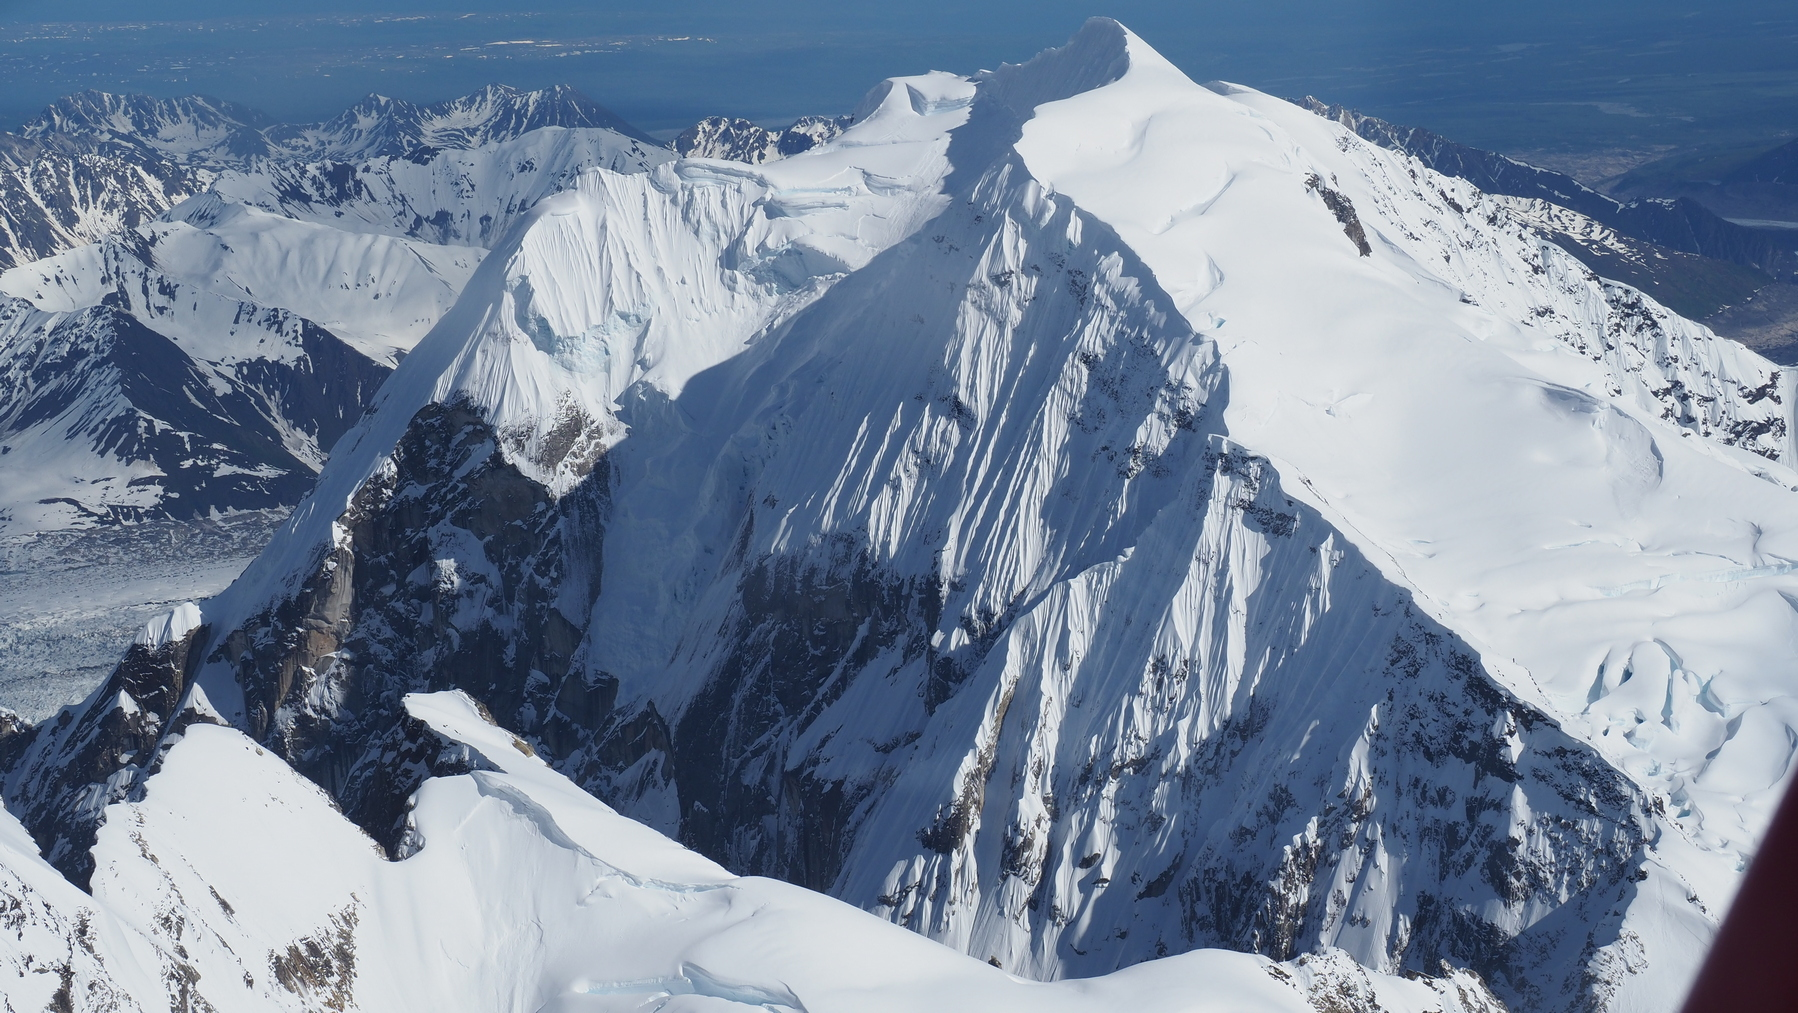 Berg in der Alaska Range